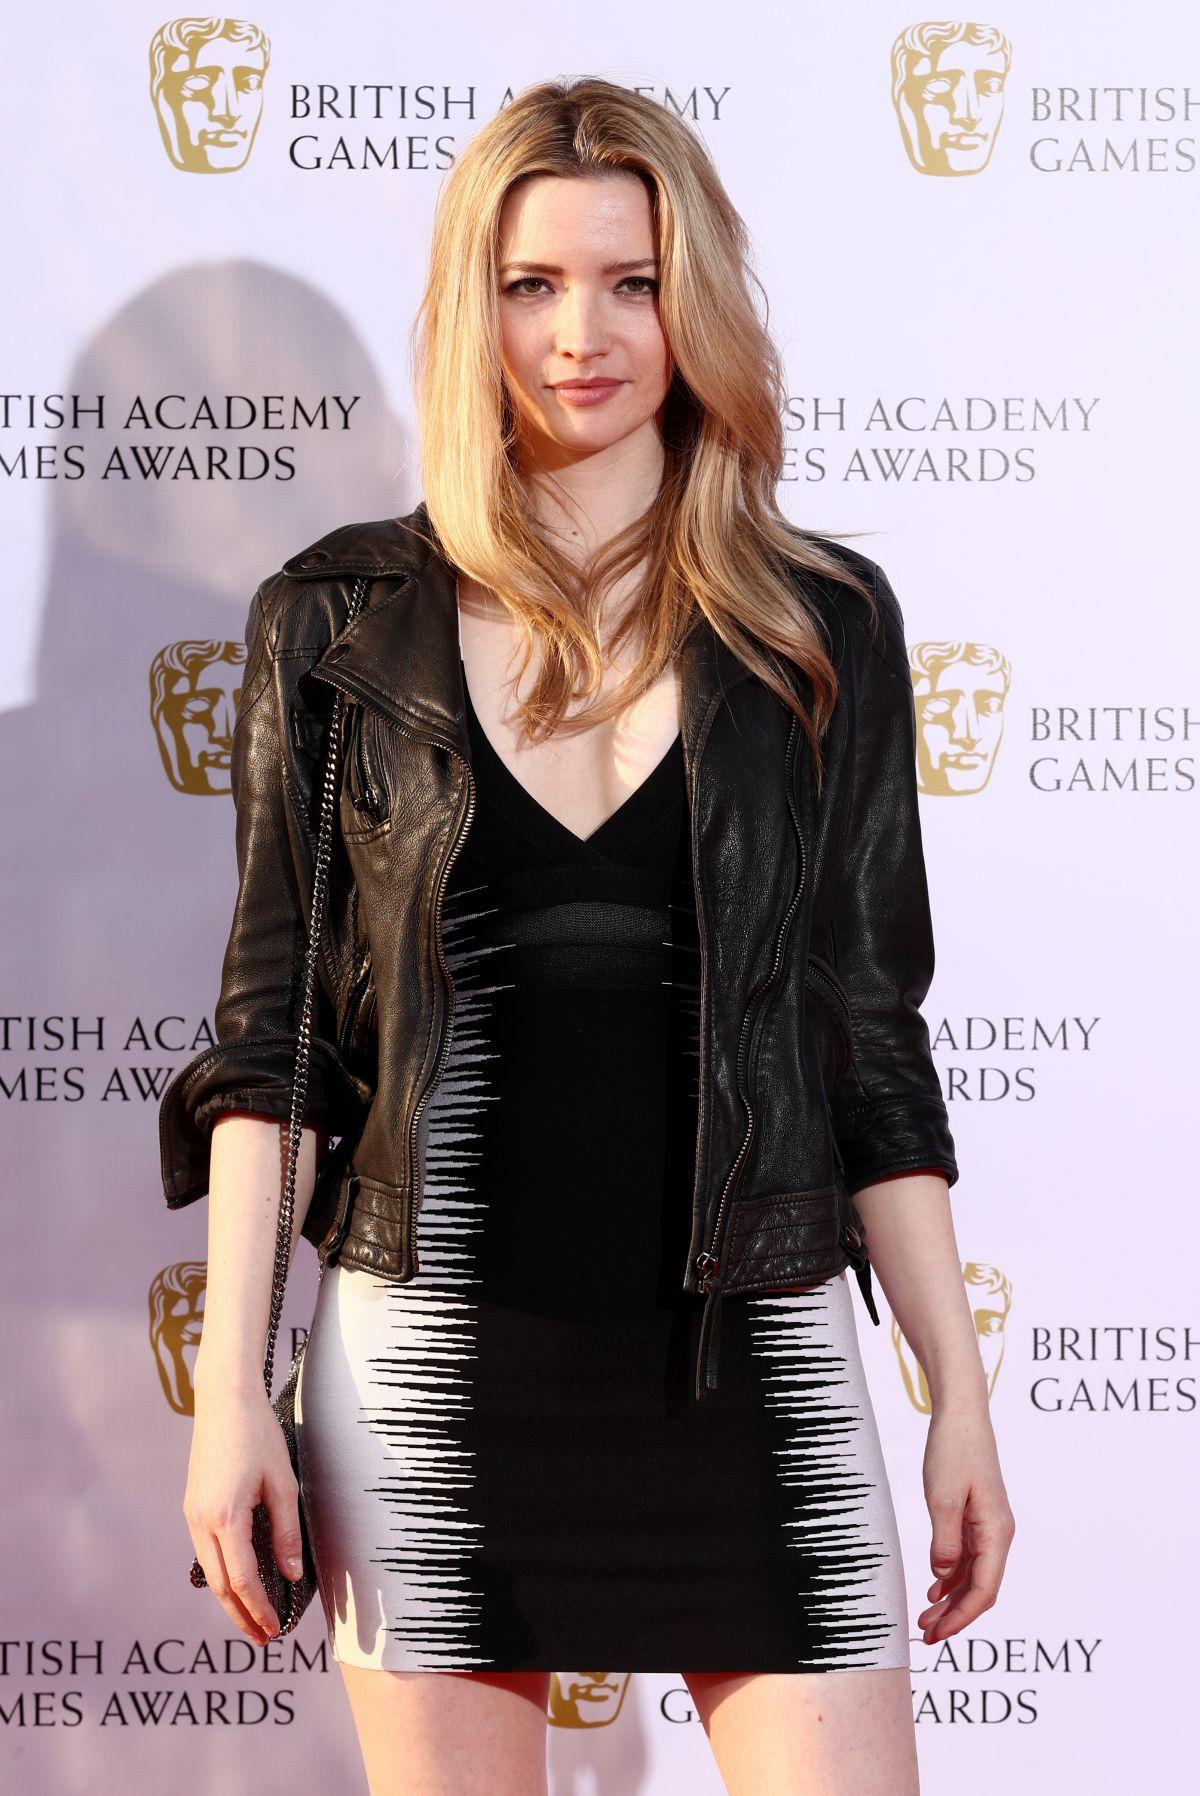 TALULAH RILEY at British Academy Games Awards in London 04/06/2017